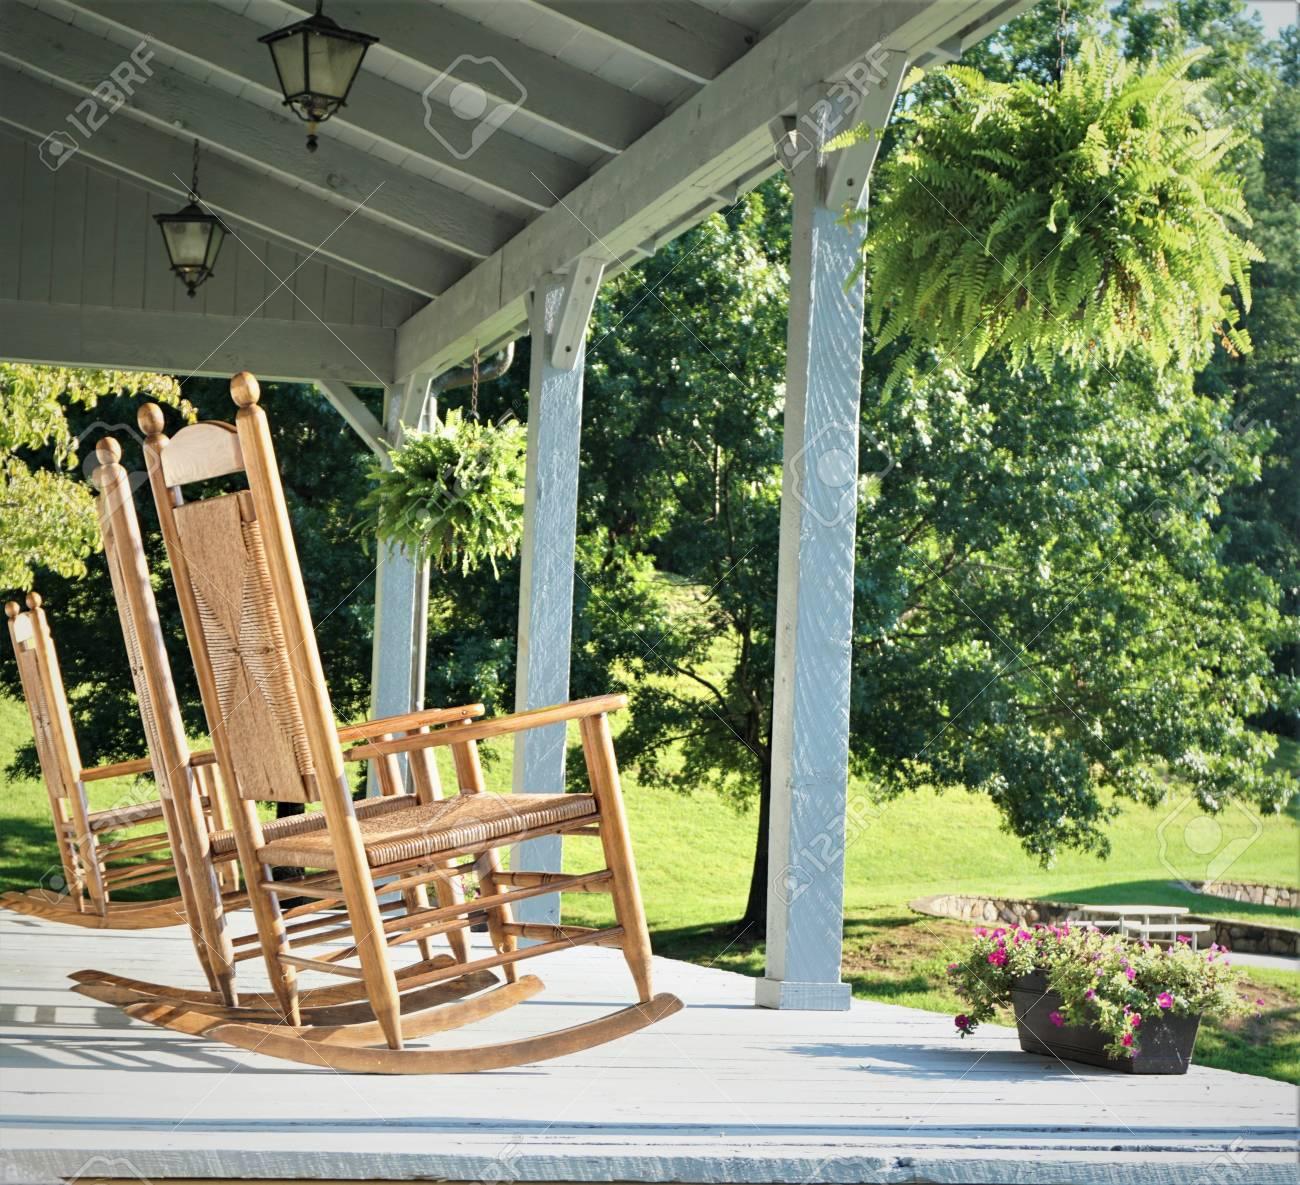 The Wooden Rocking Chairs At The Terrace House With The Beautiful View Of Garden And Big Trees Tenn Usa Fotos Retratos Imagenes Y Fotografia De Archivo Libres De Derecho Image 105573737